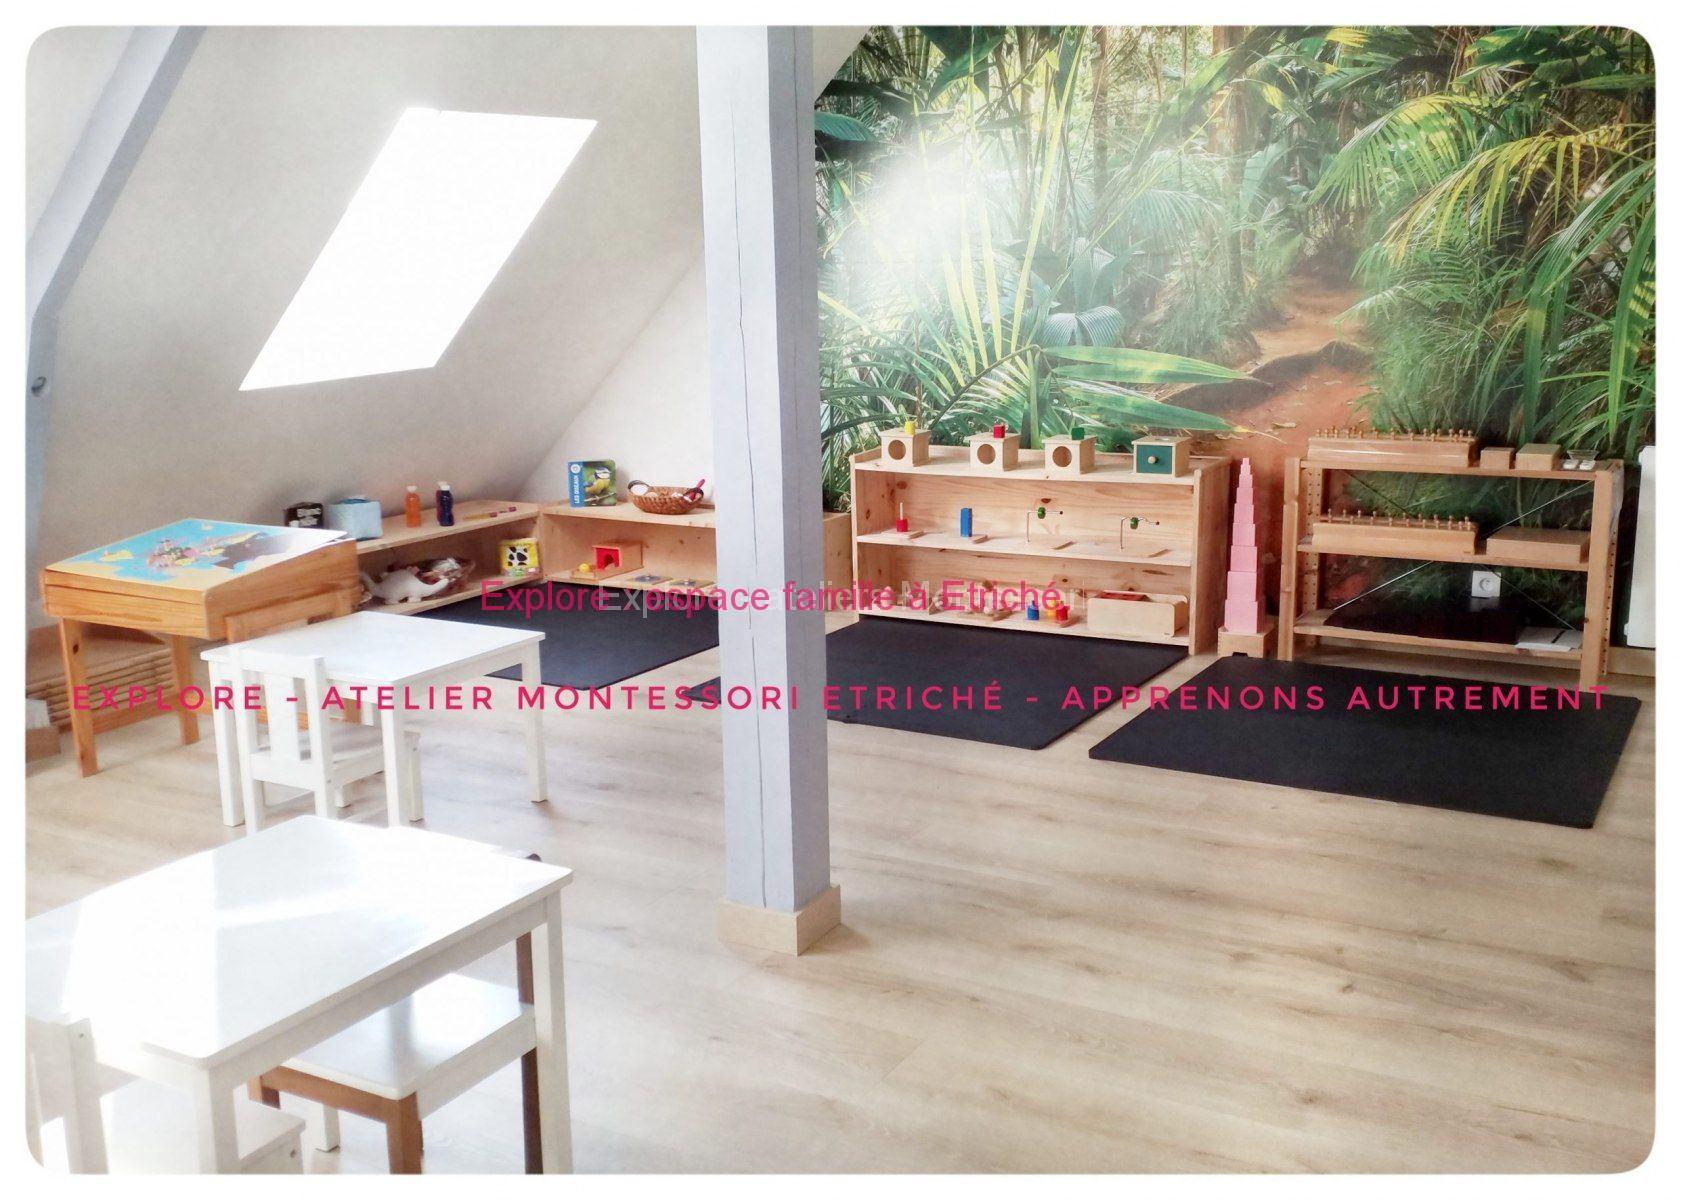 La pédagogie Montessori s'installe à la campagne